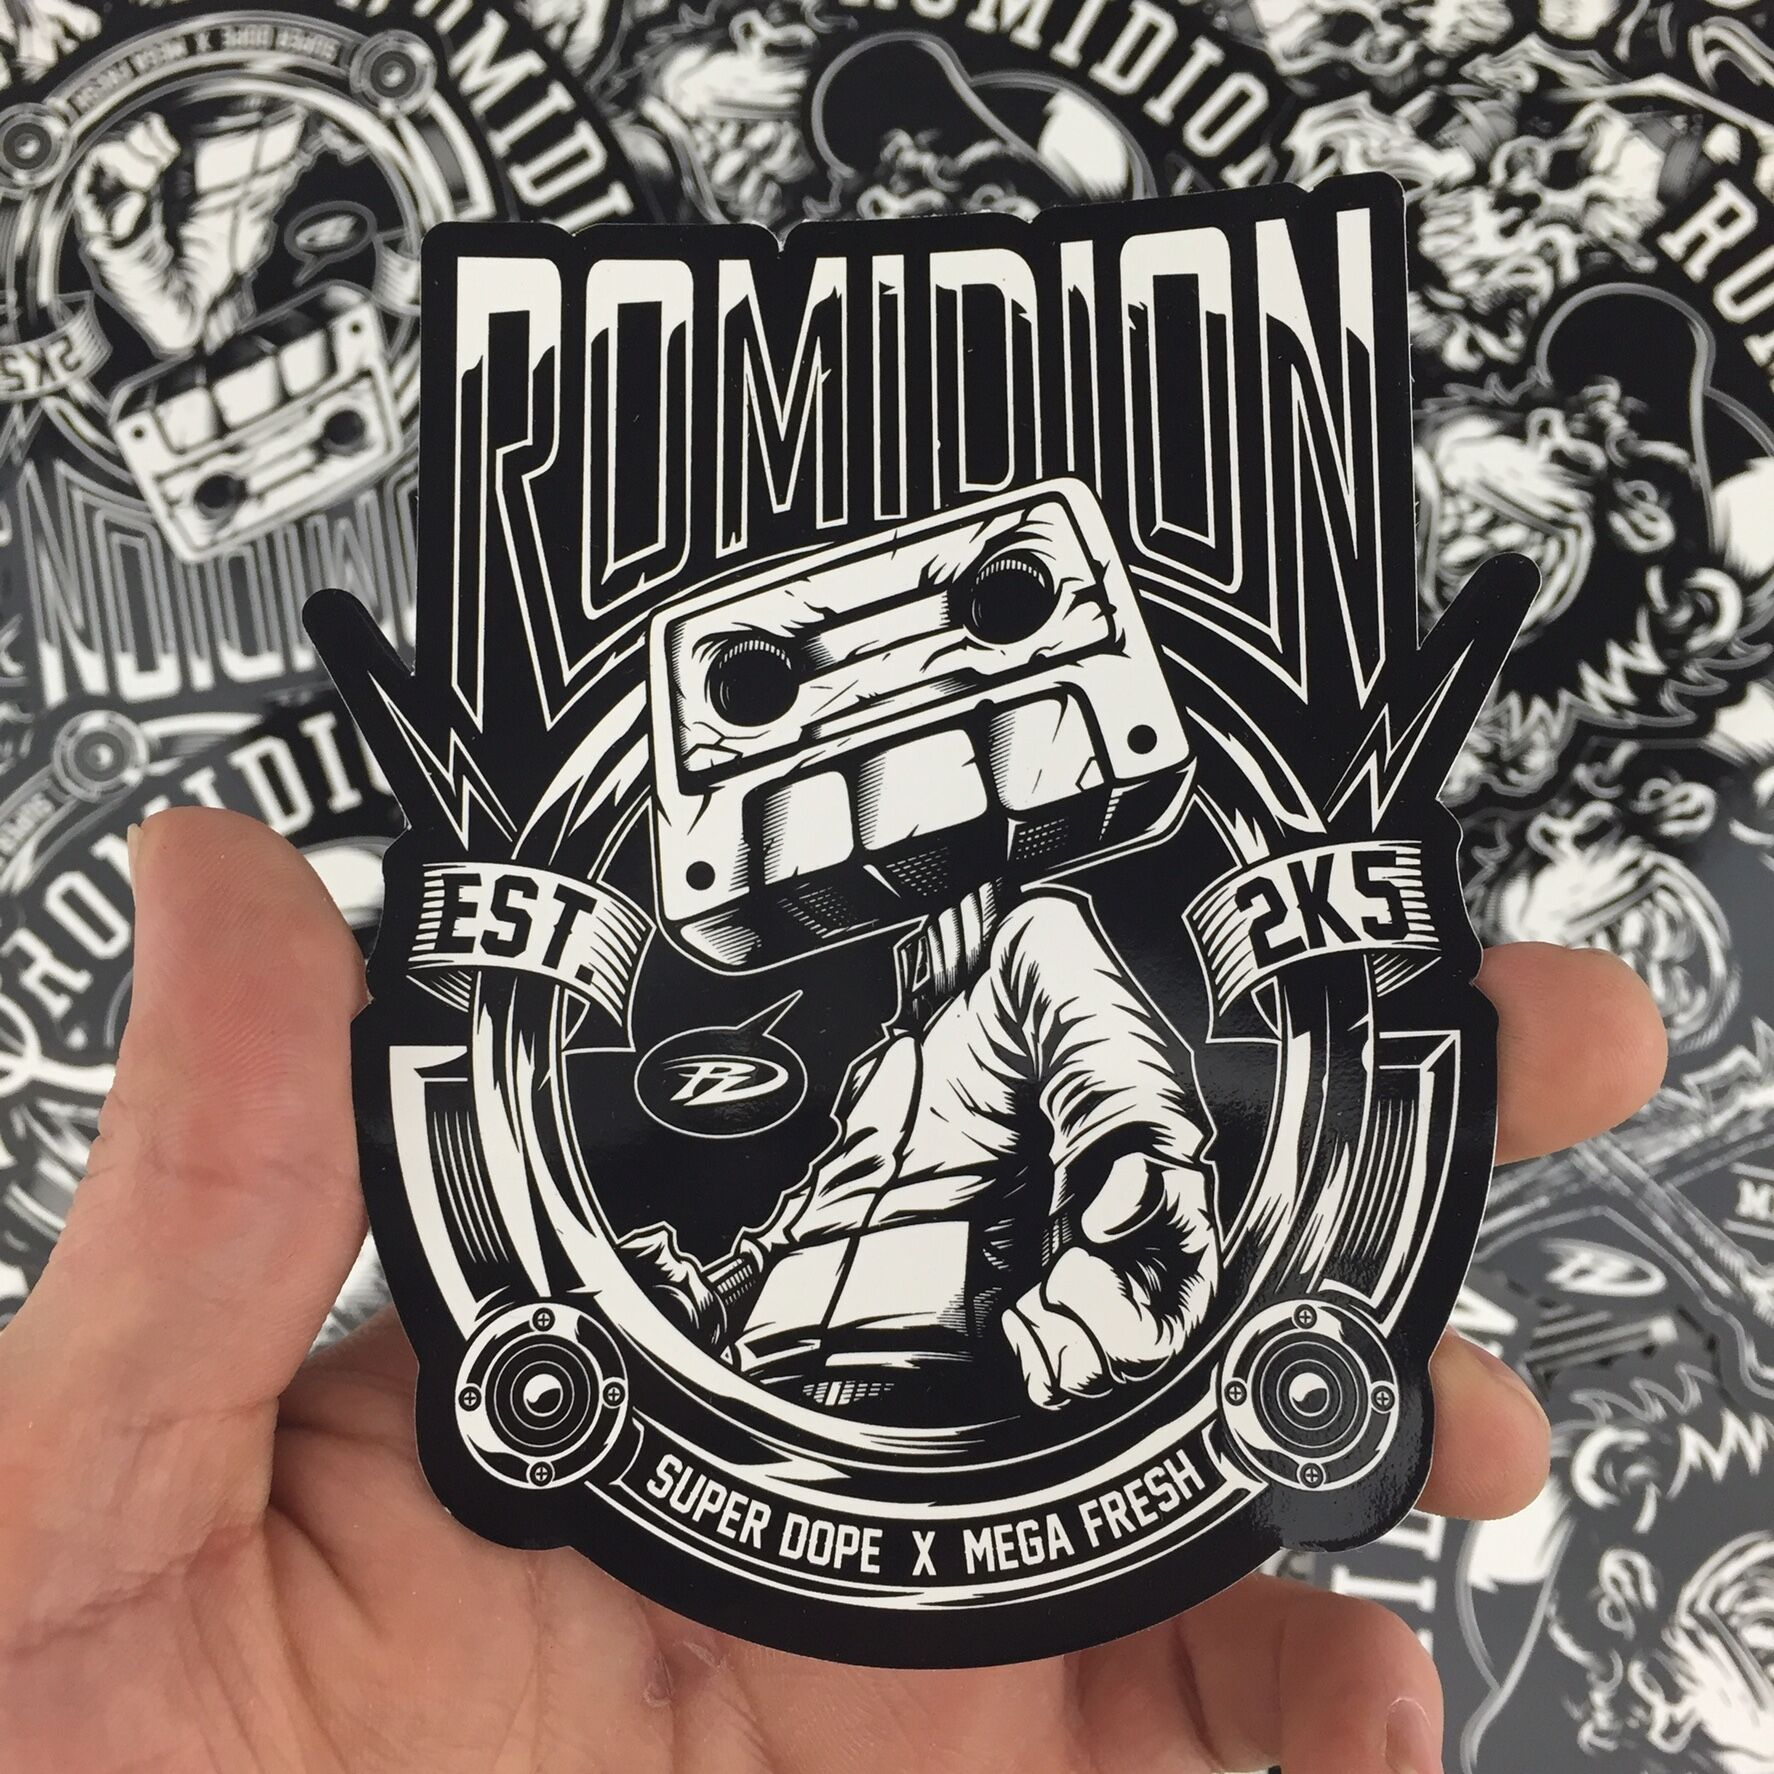 romidion3.jpeg